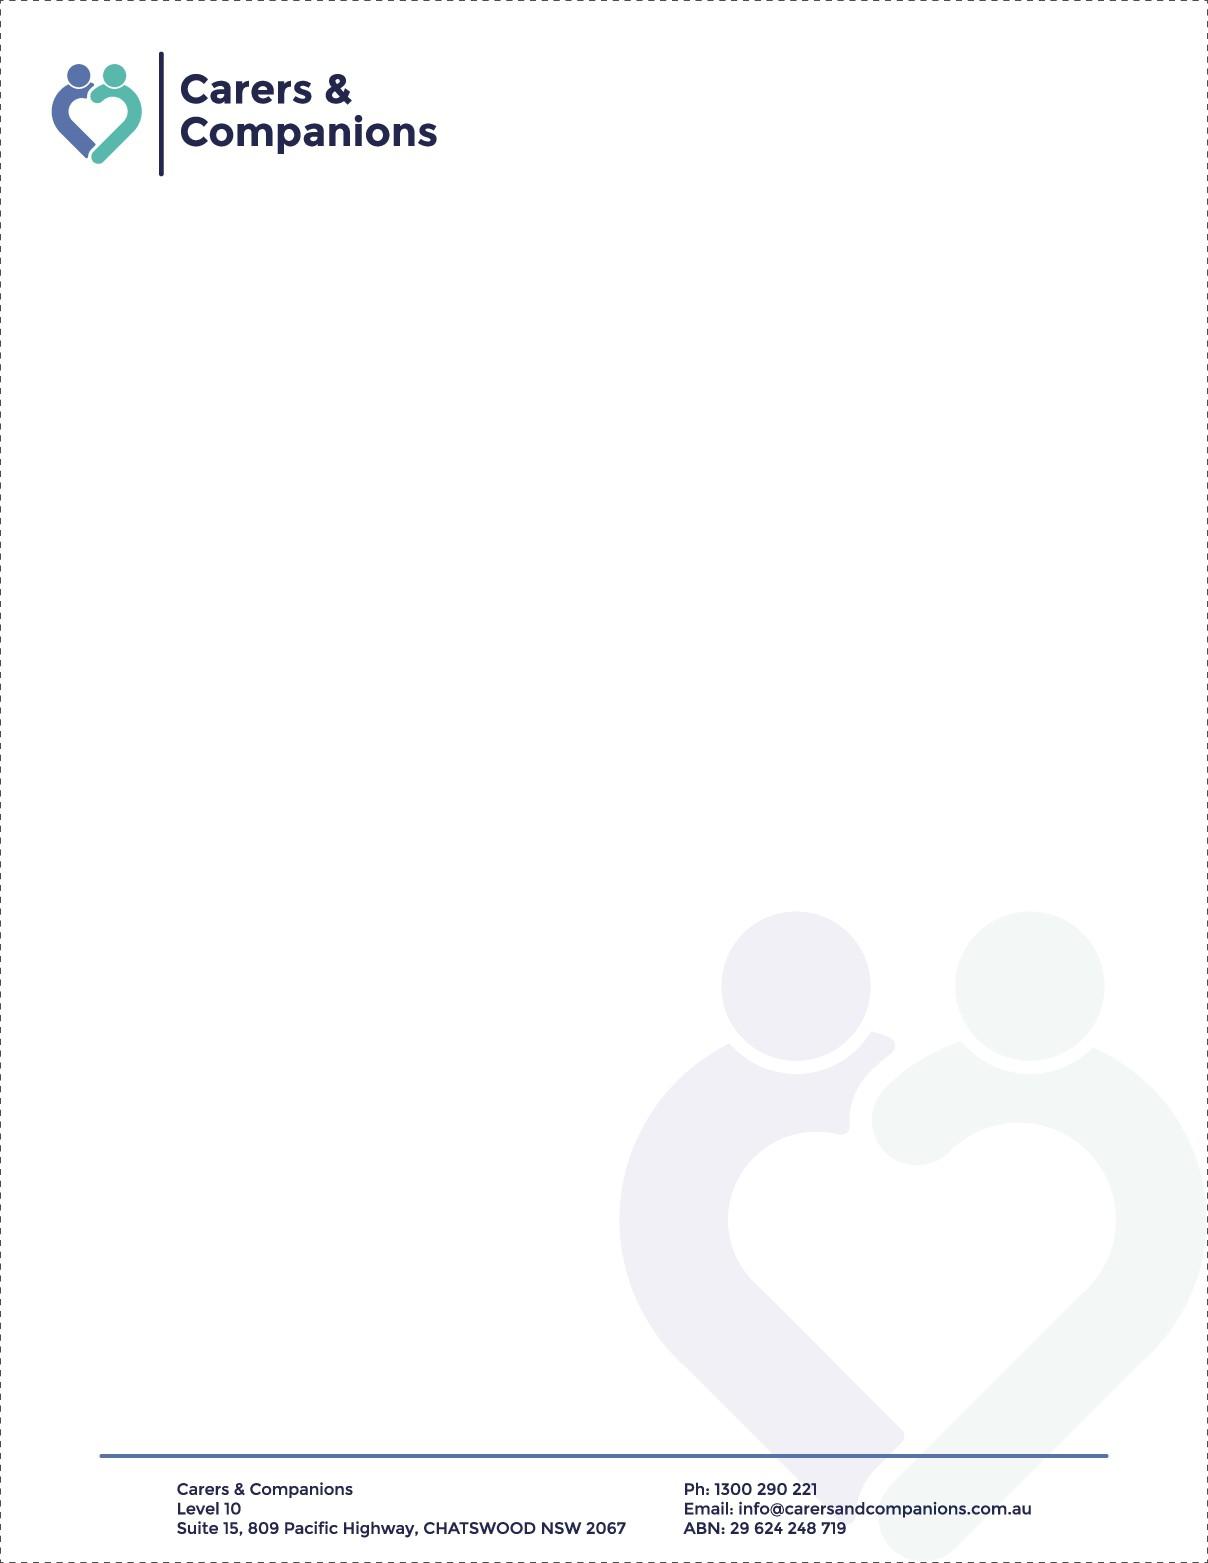 Letterhead + business card template